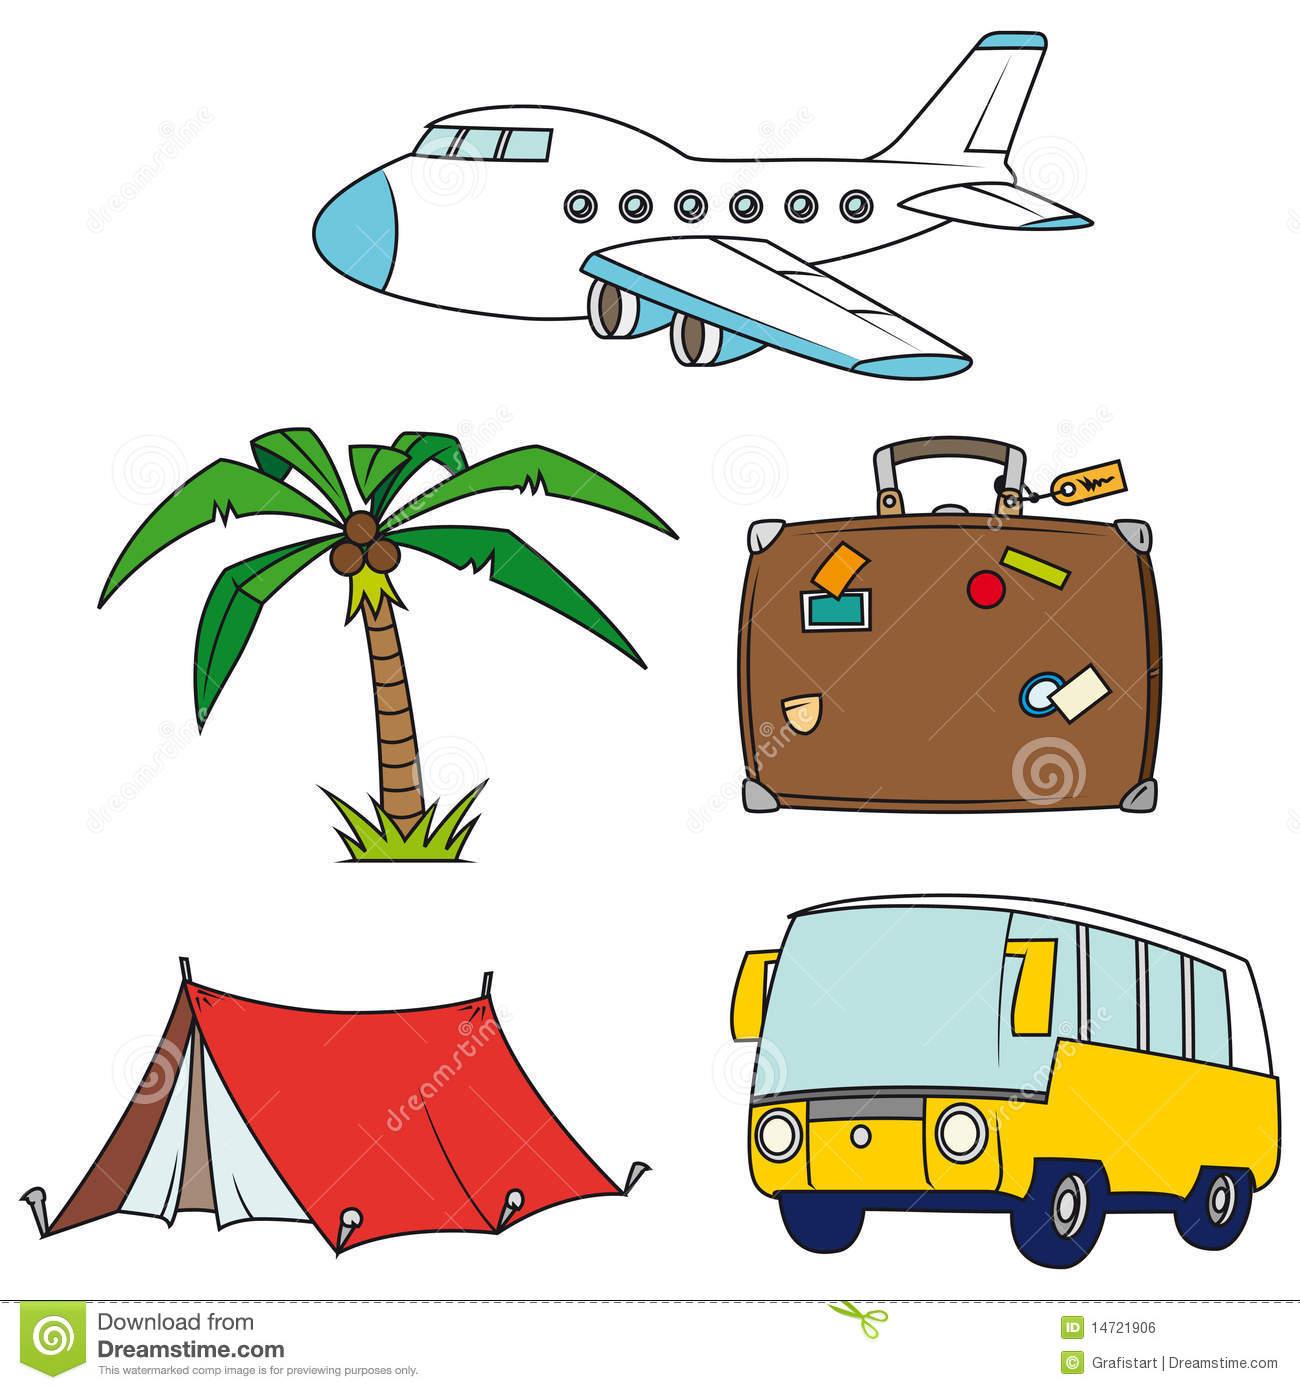 travel clipart free - photo #19